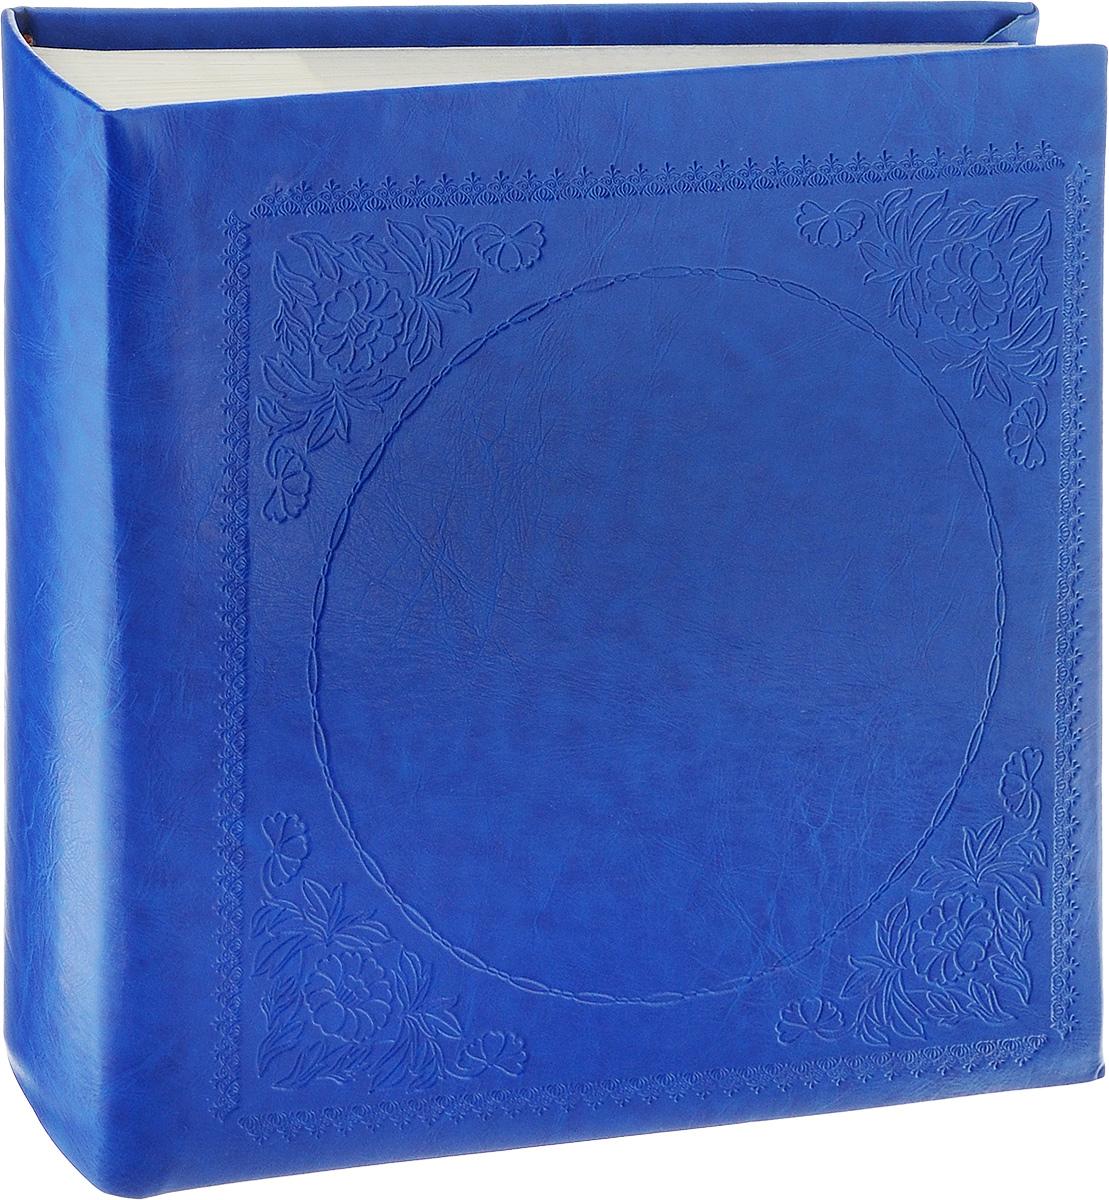 Фотоальбом Pioneer Glossy Leathern, 200 фотографий, цвет: синий, 10 x 15 см фотоальбом platinum классика 240 фотографий 10 x 15 см